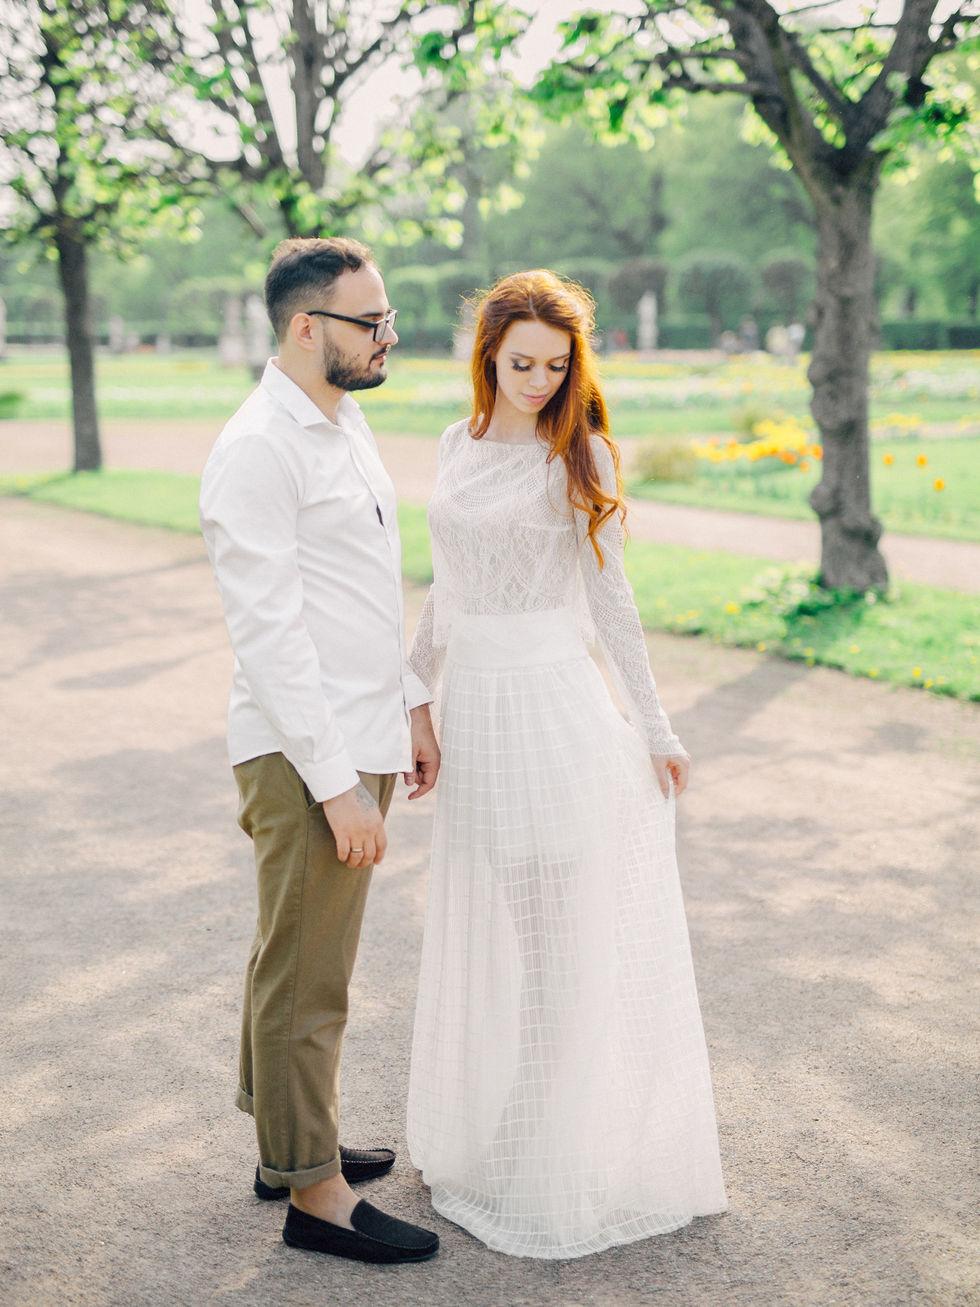 2019.05.10 Irina & Bogdan Kuskovo-45.jpg